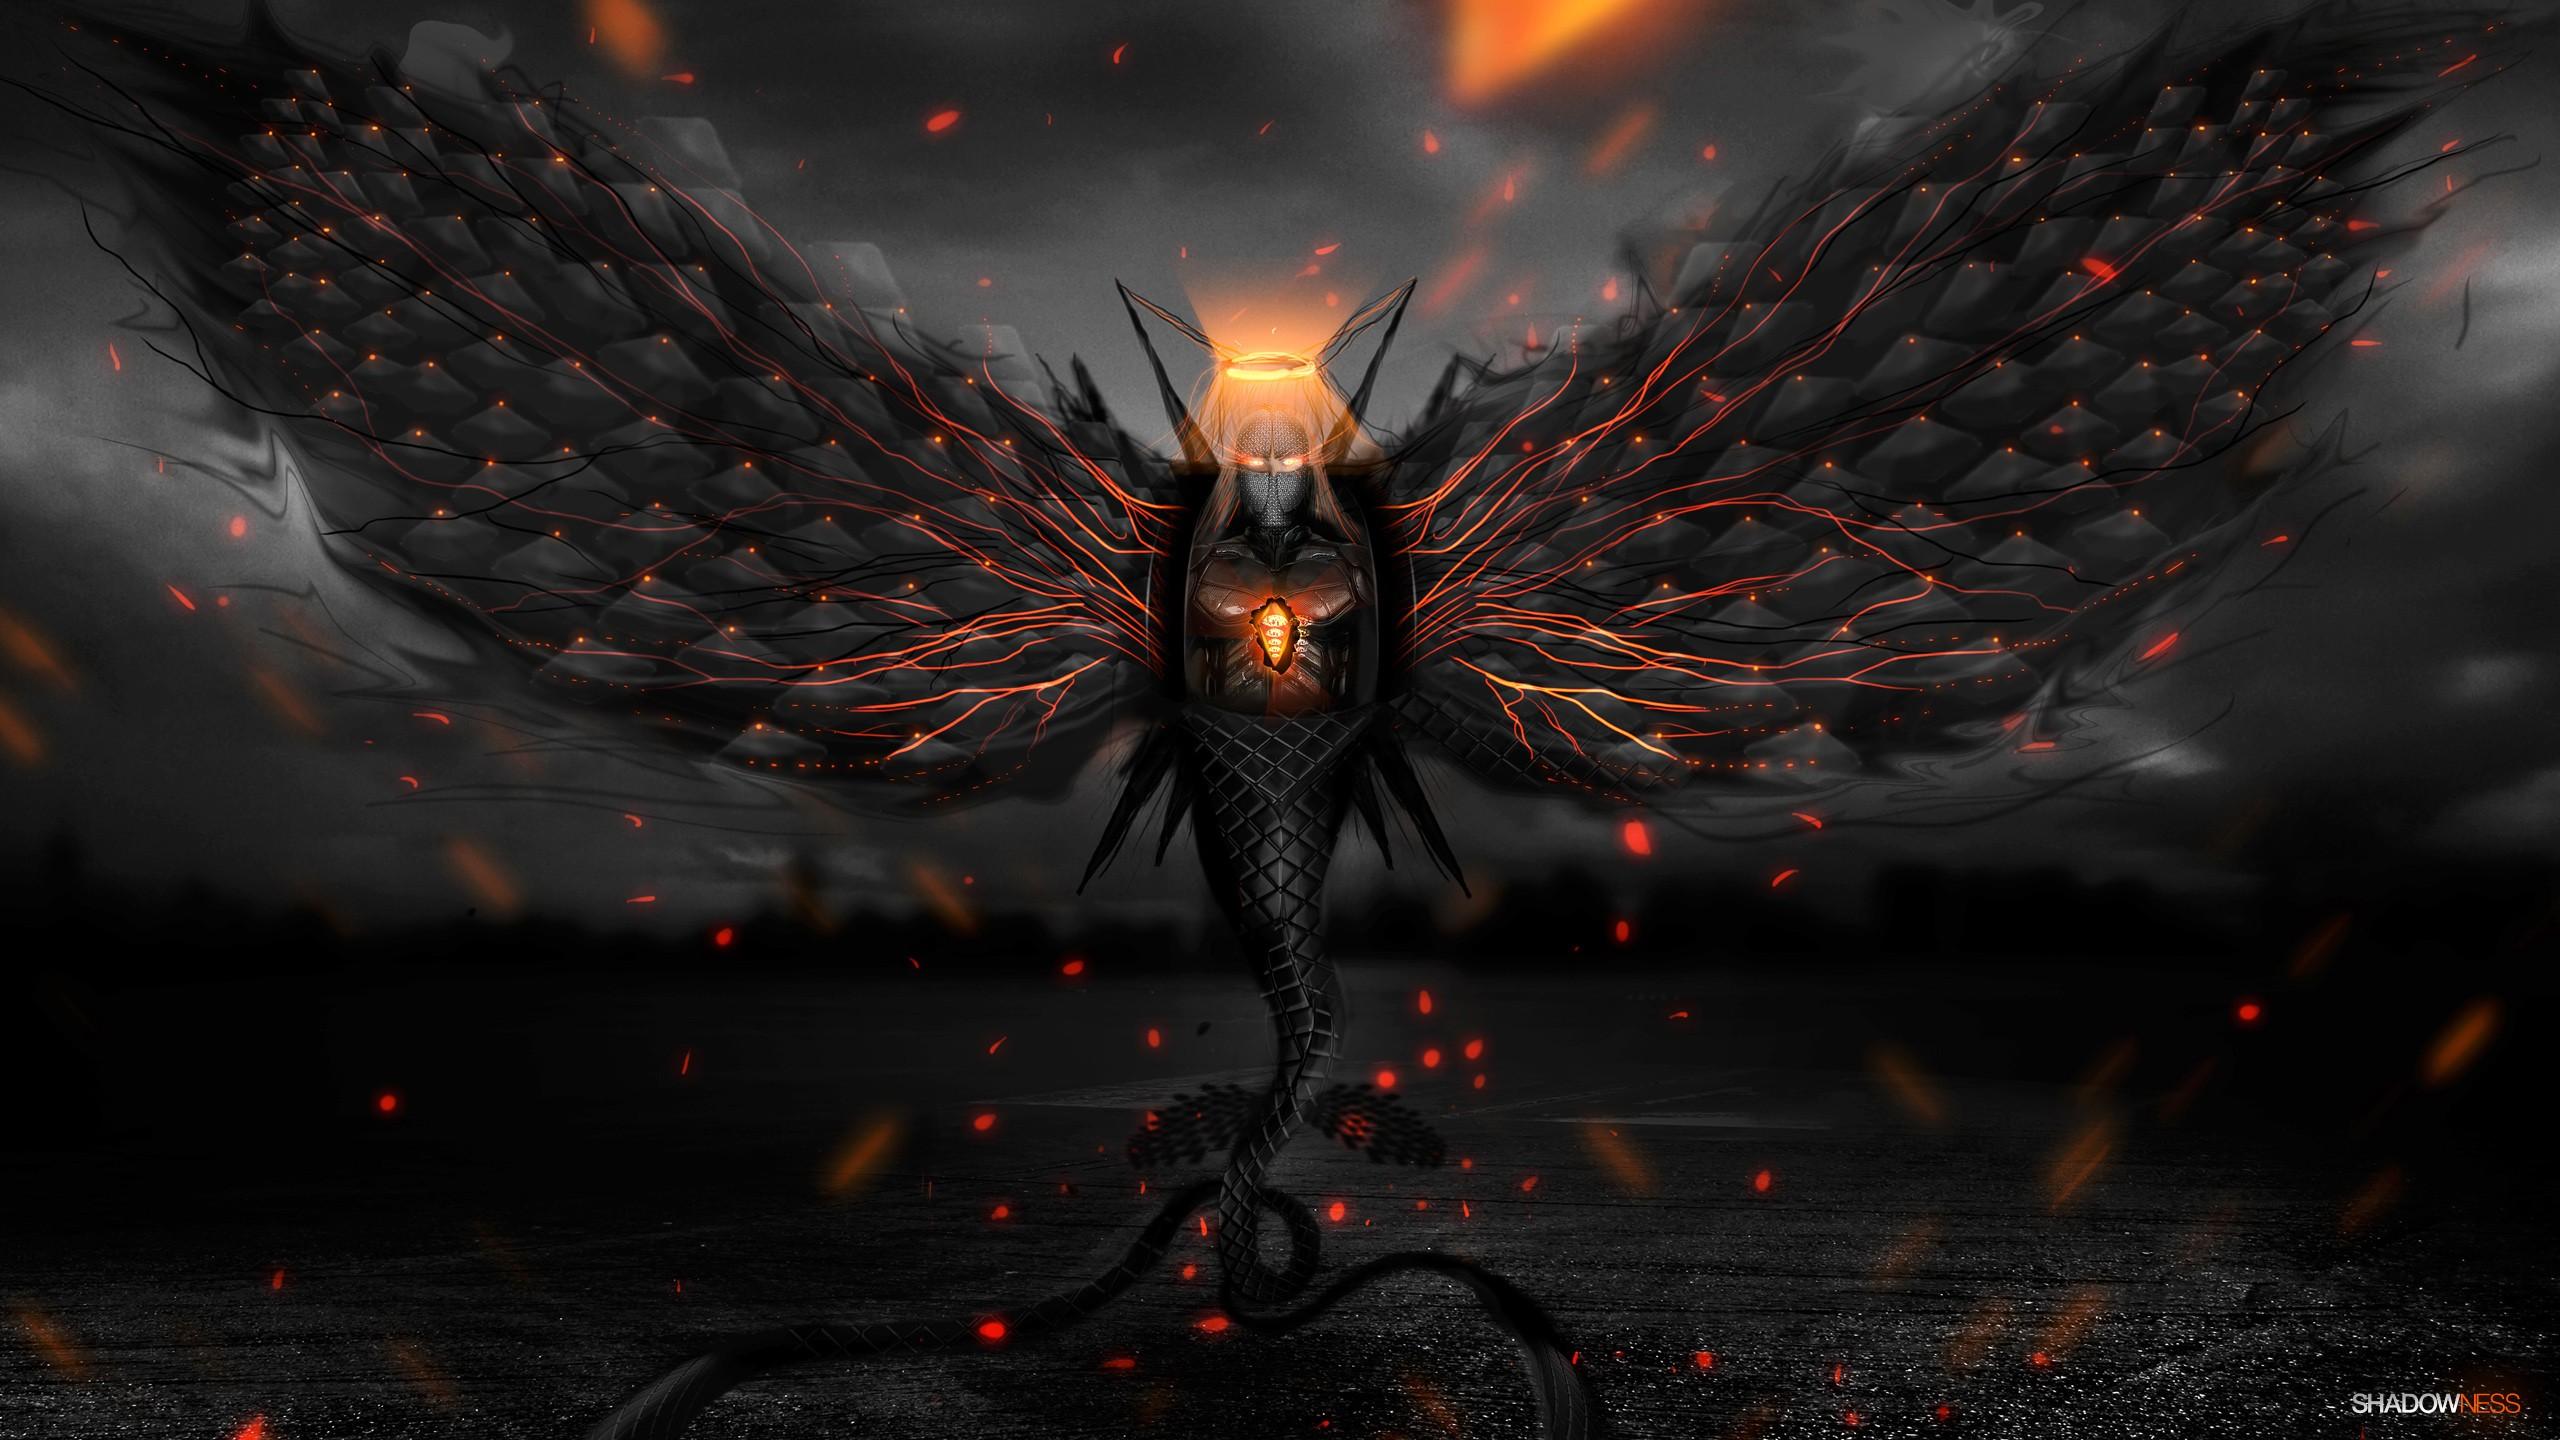 Demon hd wallpaper background image 2560x1440 id - Demon wallpaper 4k ...